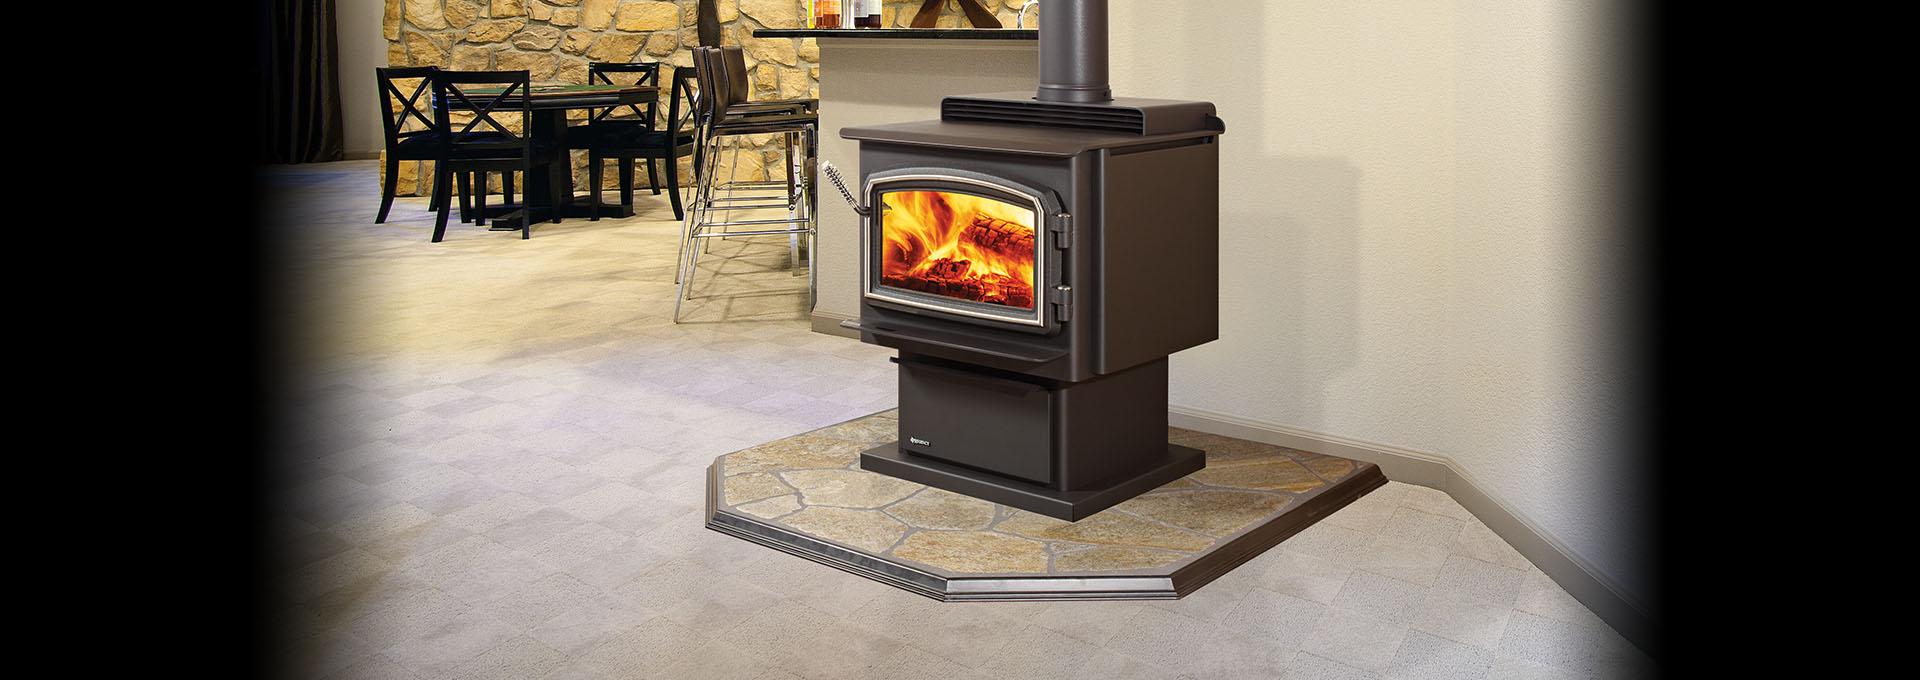 f2400 medium wood stove regency fireplace products rh regency fire com Regency Wood Stove Parts Regency Fireplace Parts